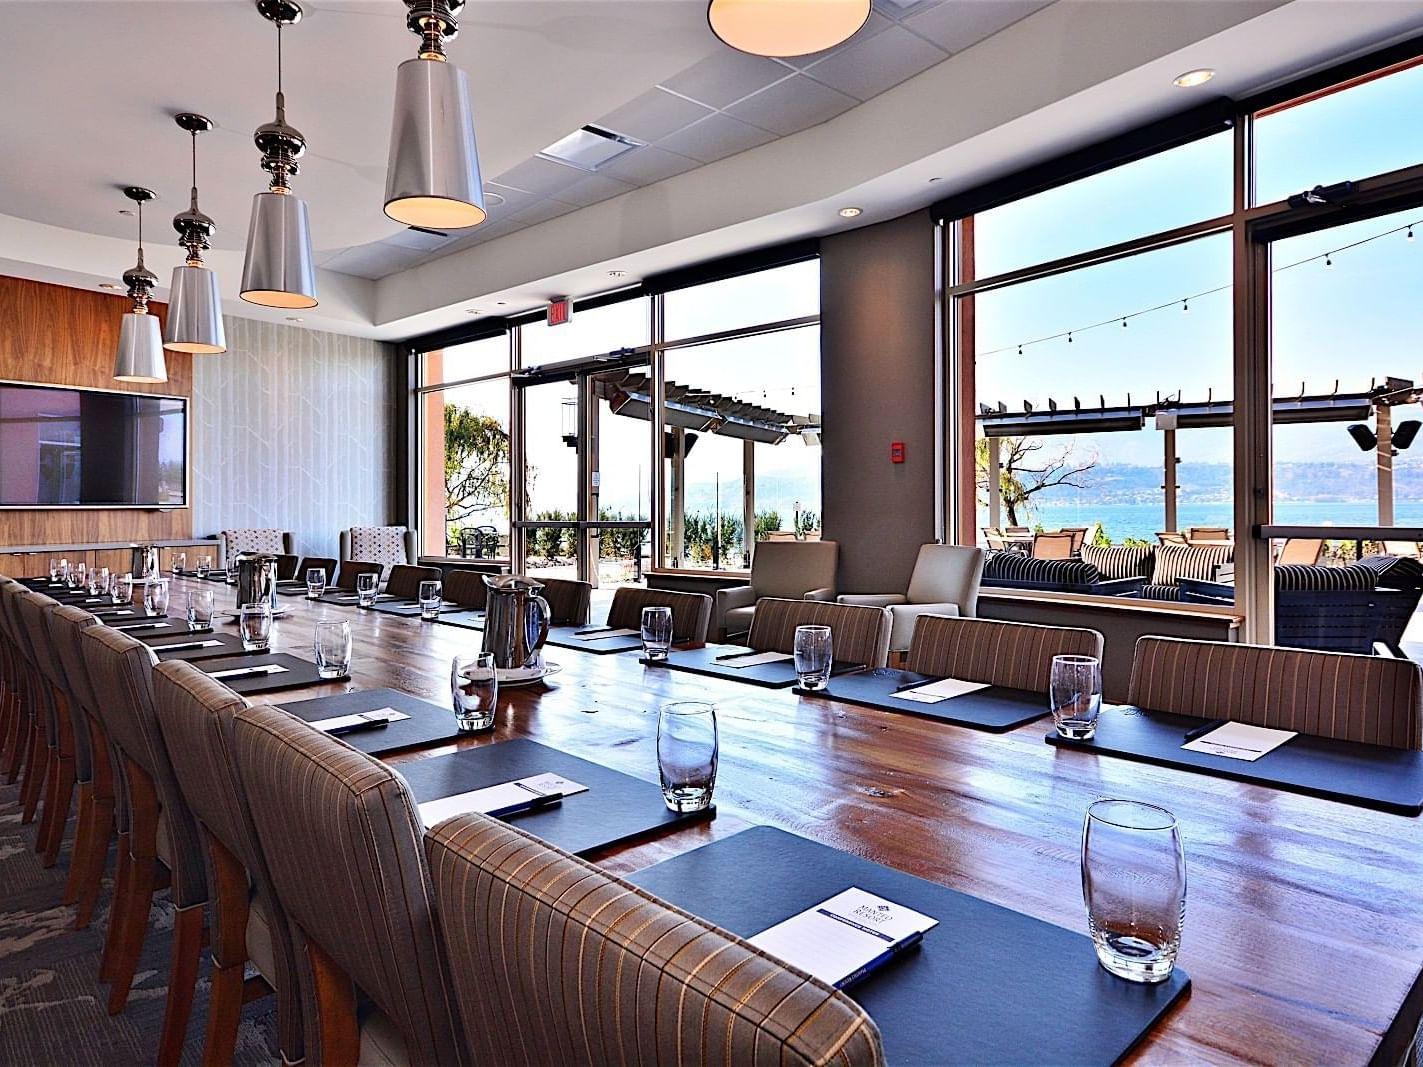 Event room with meeting arrangements at Manteo Resort